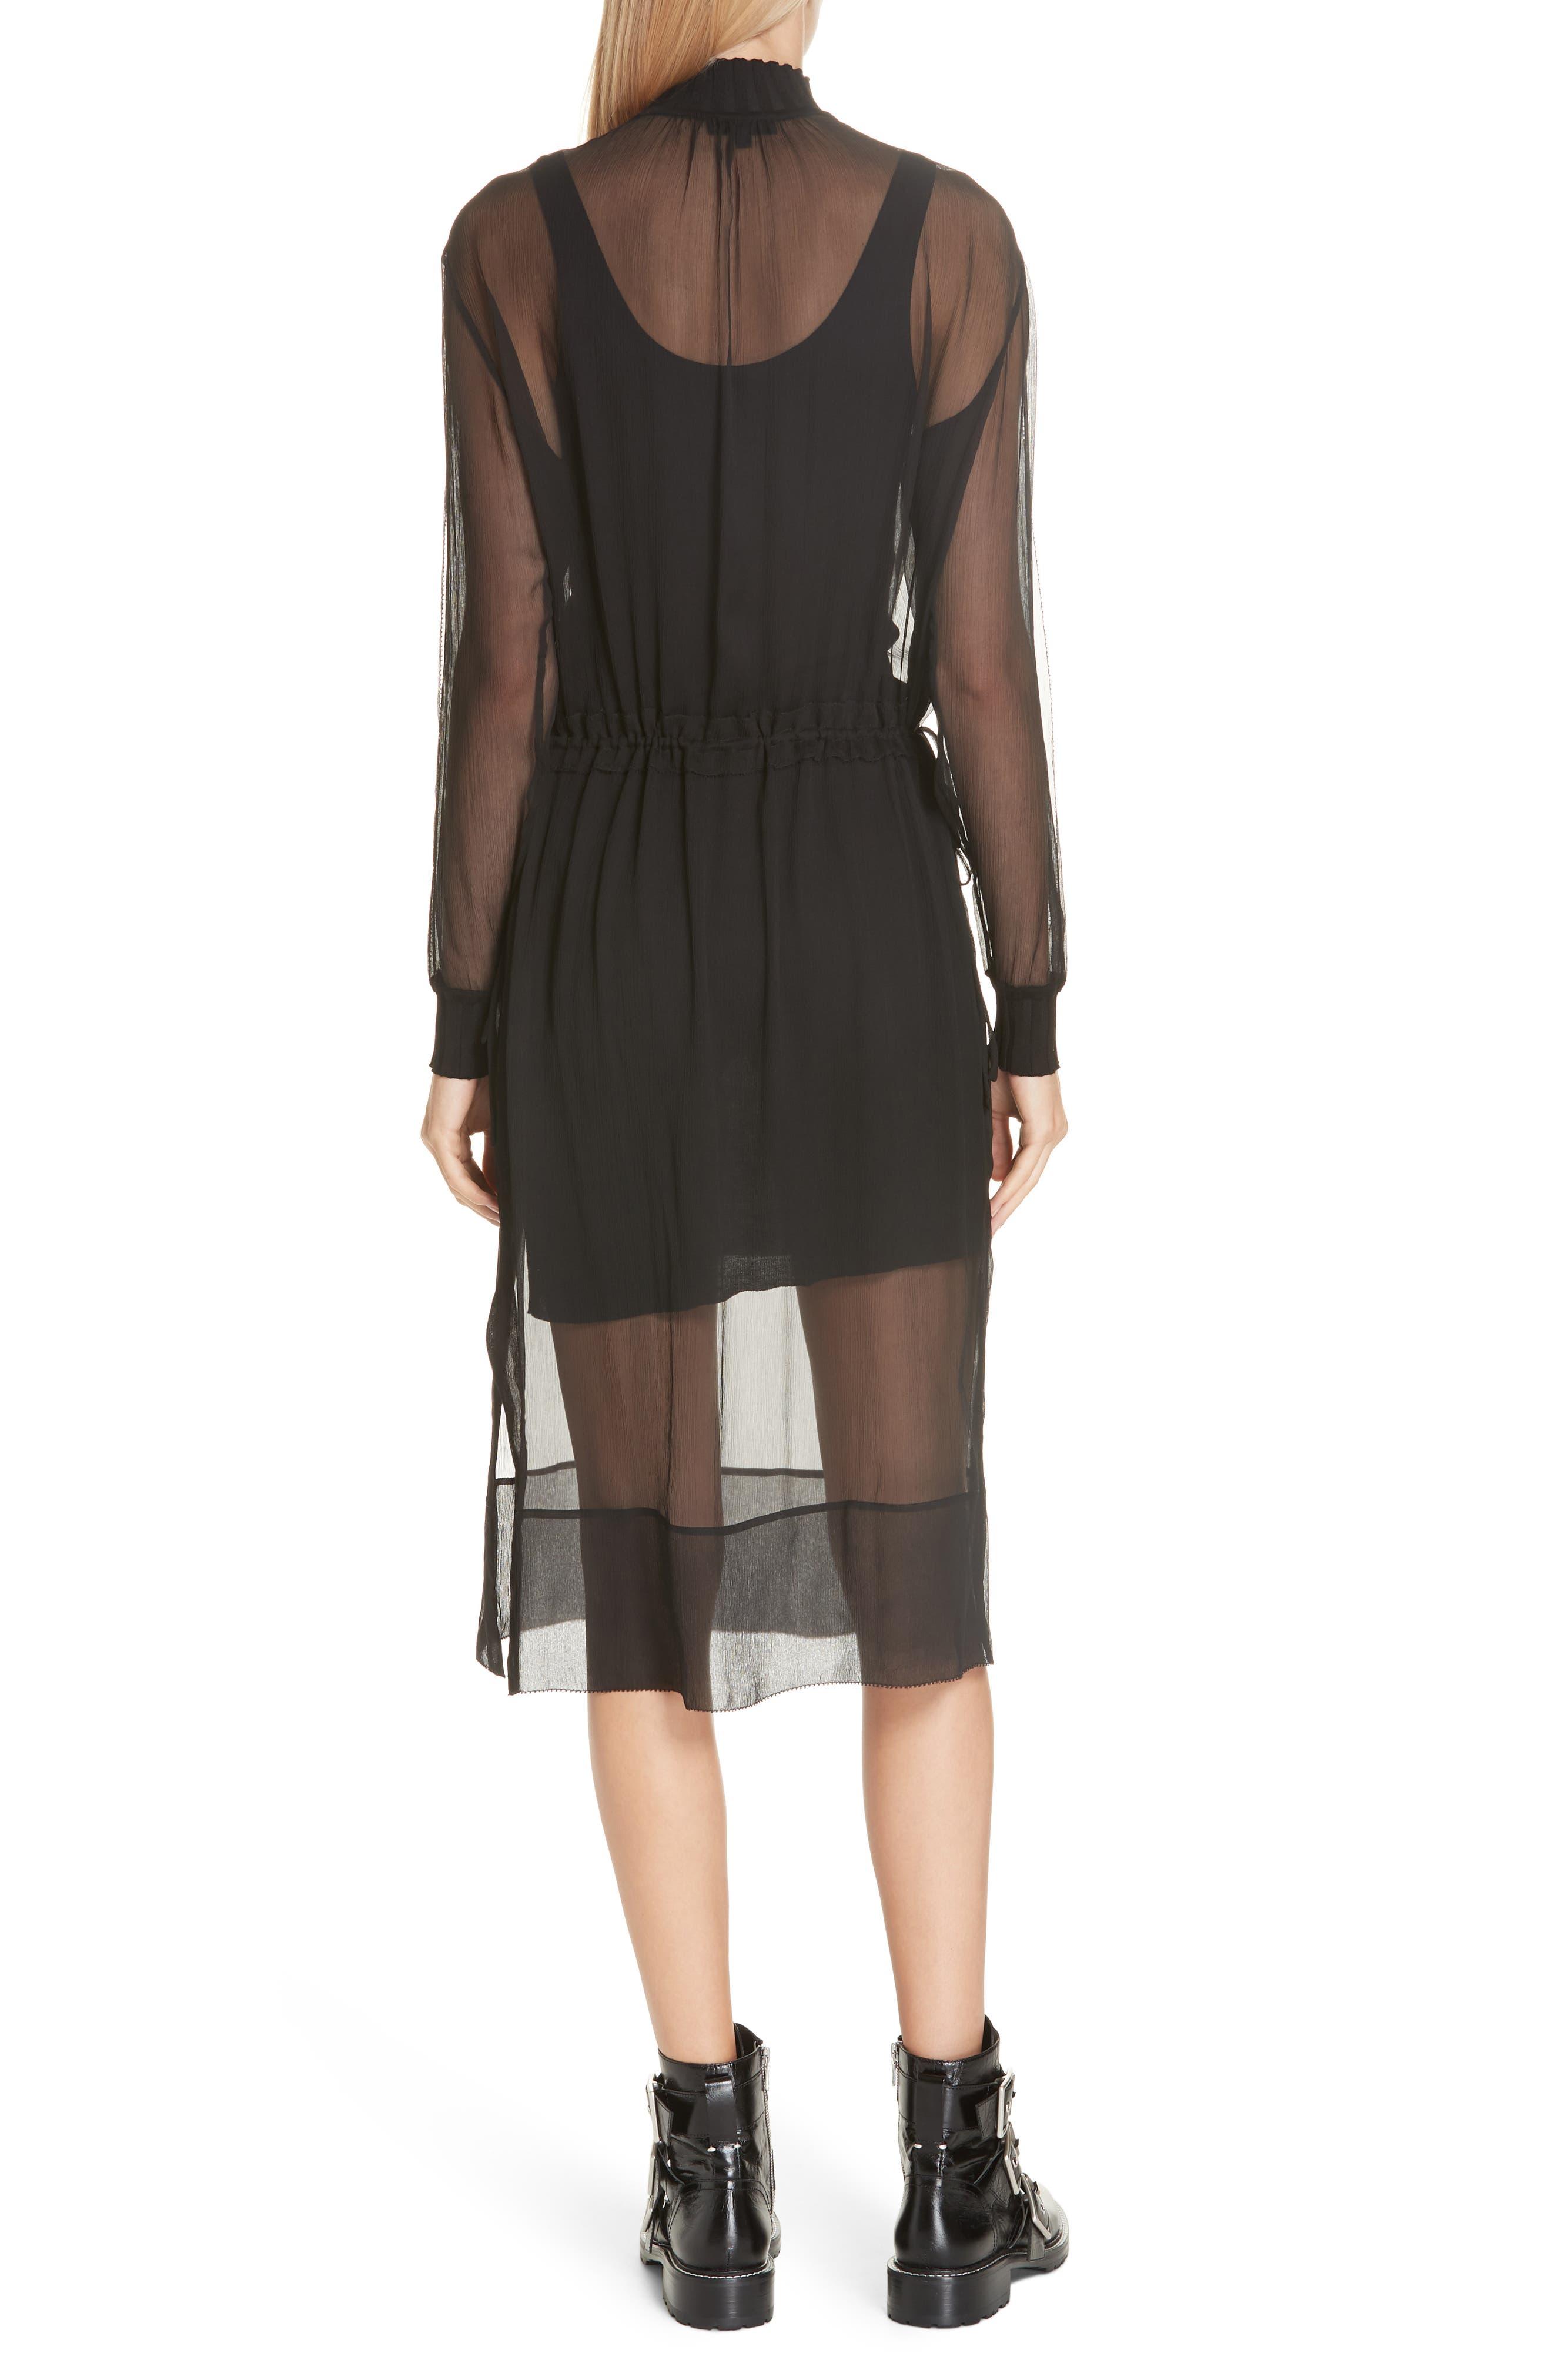 RAG & BONE, Dinah Silk Dress, Alternate thumbnail 2, color, 001